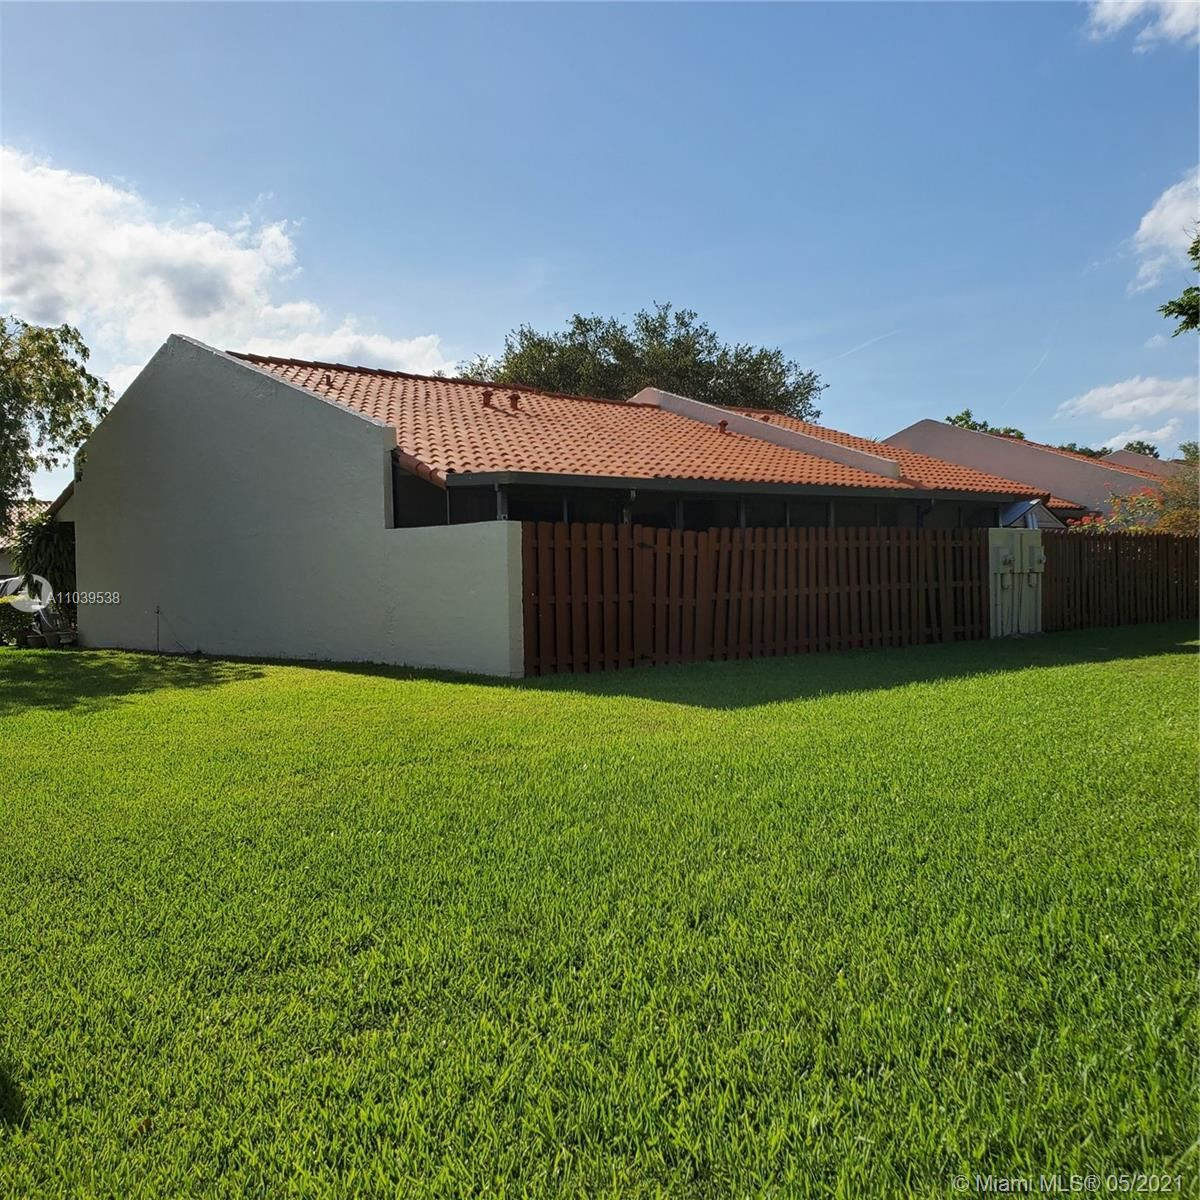 Photo of 5748 SW 112th Ter, Cooper City, FL 33330 (MLS # A11039538)